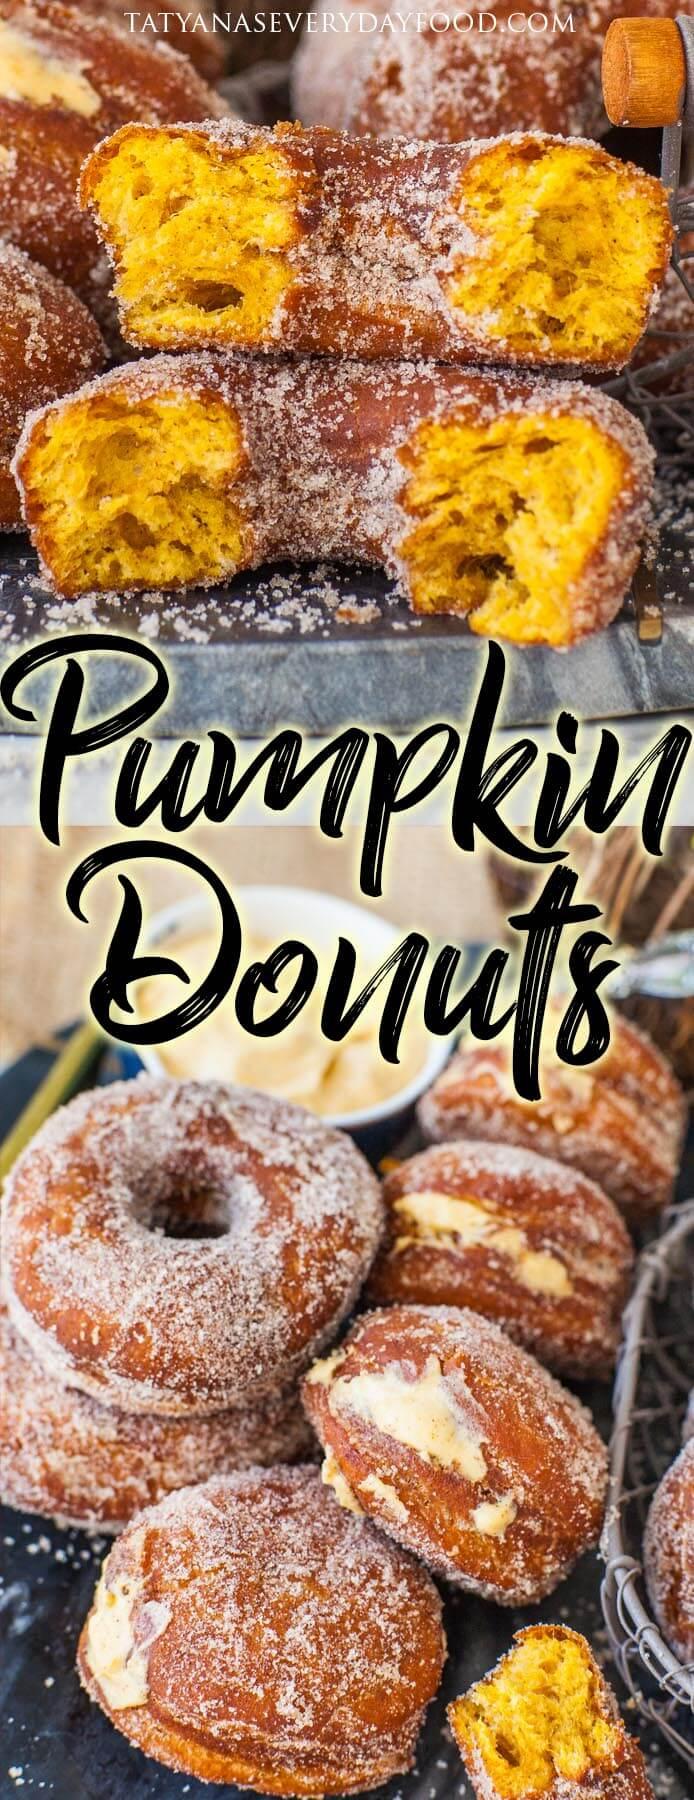 Amazing Pumpkin Donuts 2 Ways (video)